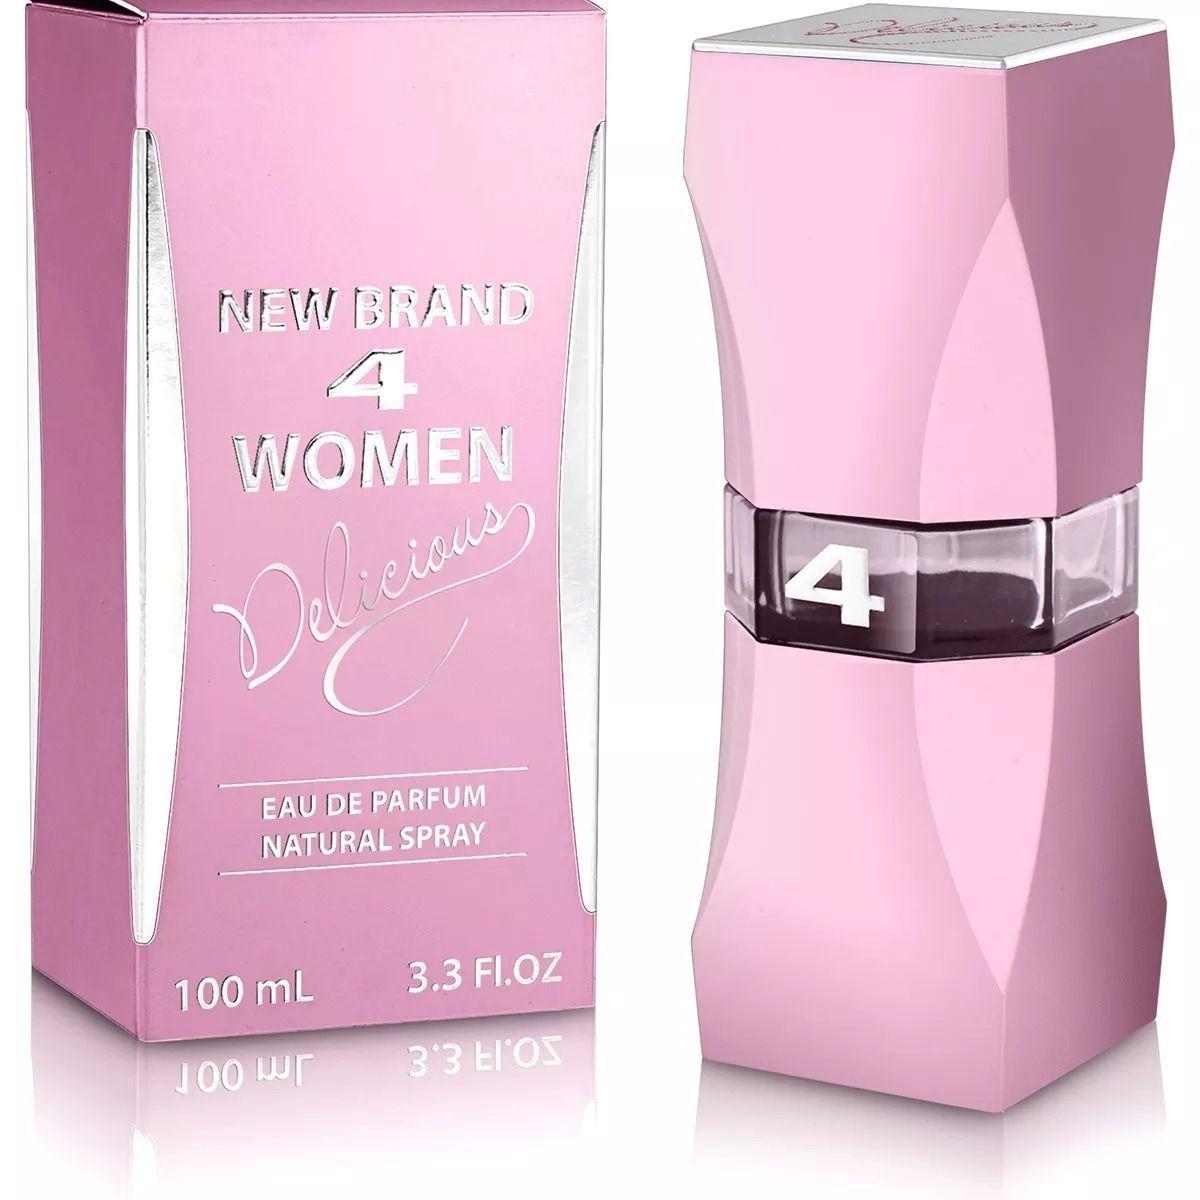 4 Women Delicious New Brand Feminino Eau de Parfum 100ML